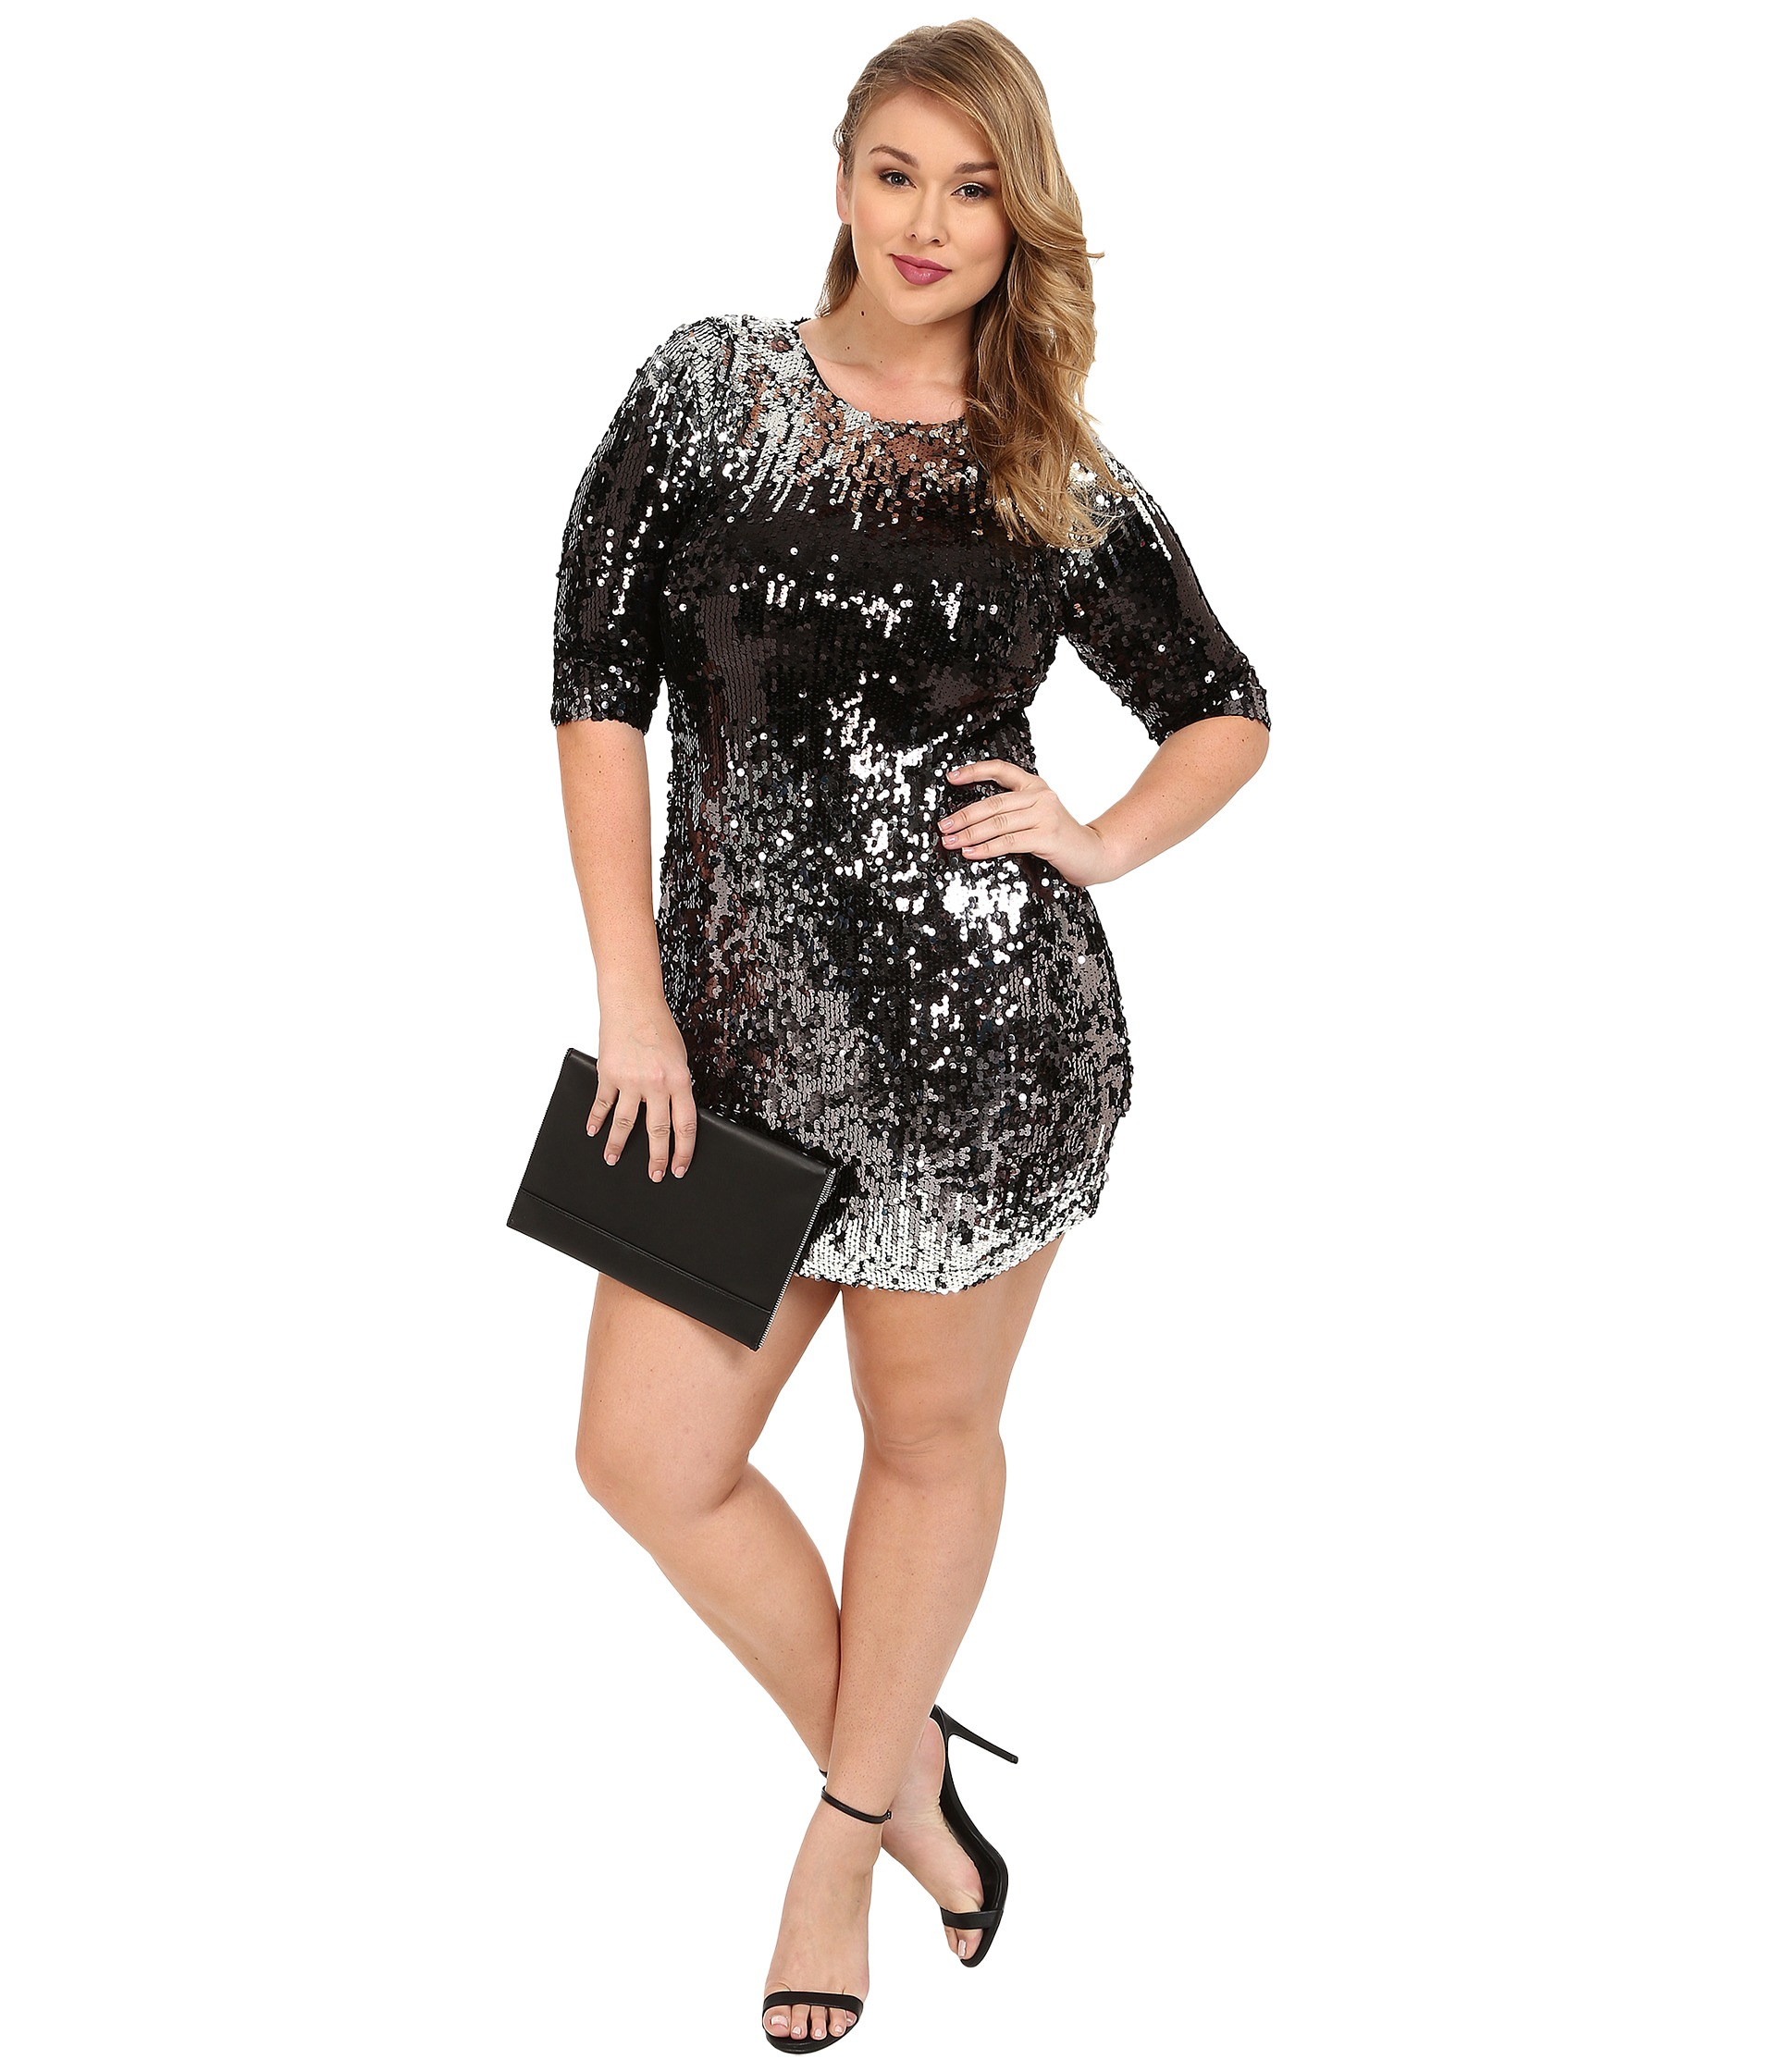 Bb dakota Plus Size Gigi Ombre Sequin Dress - Lyst